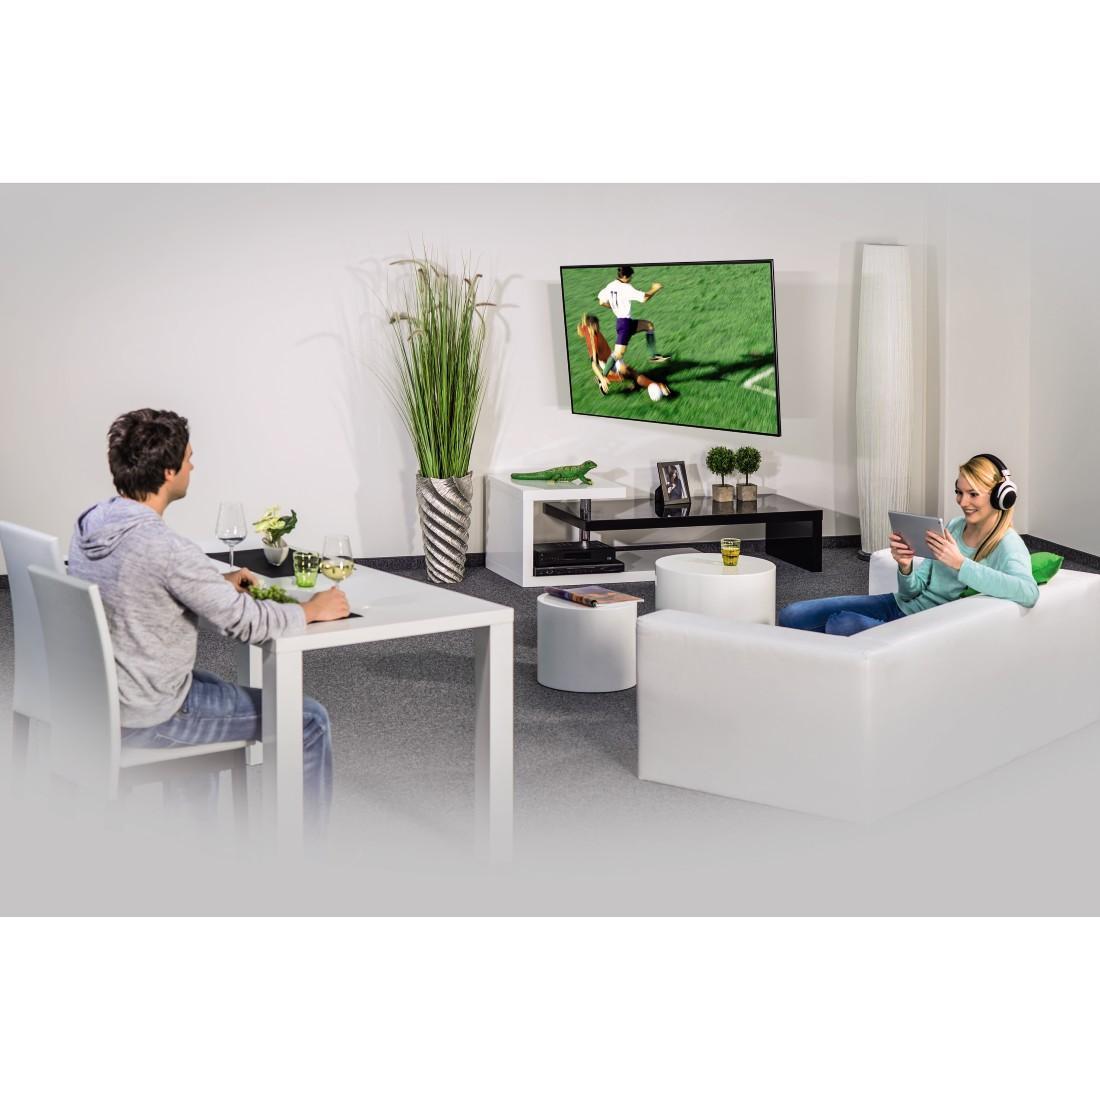 "Hama TV-Wandhalterung ""Ultraslim"", VESA 200x200, neigbar"